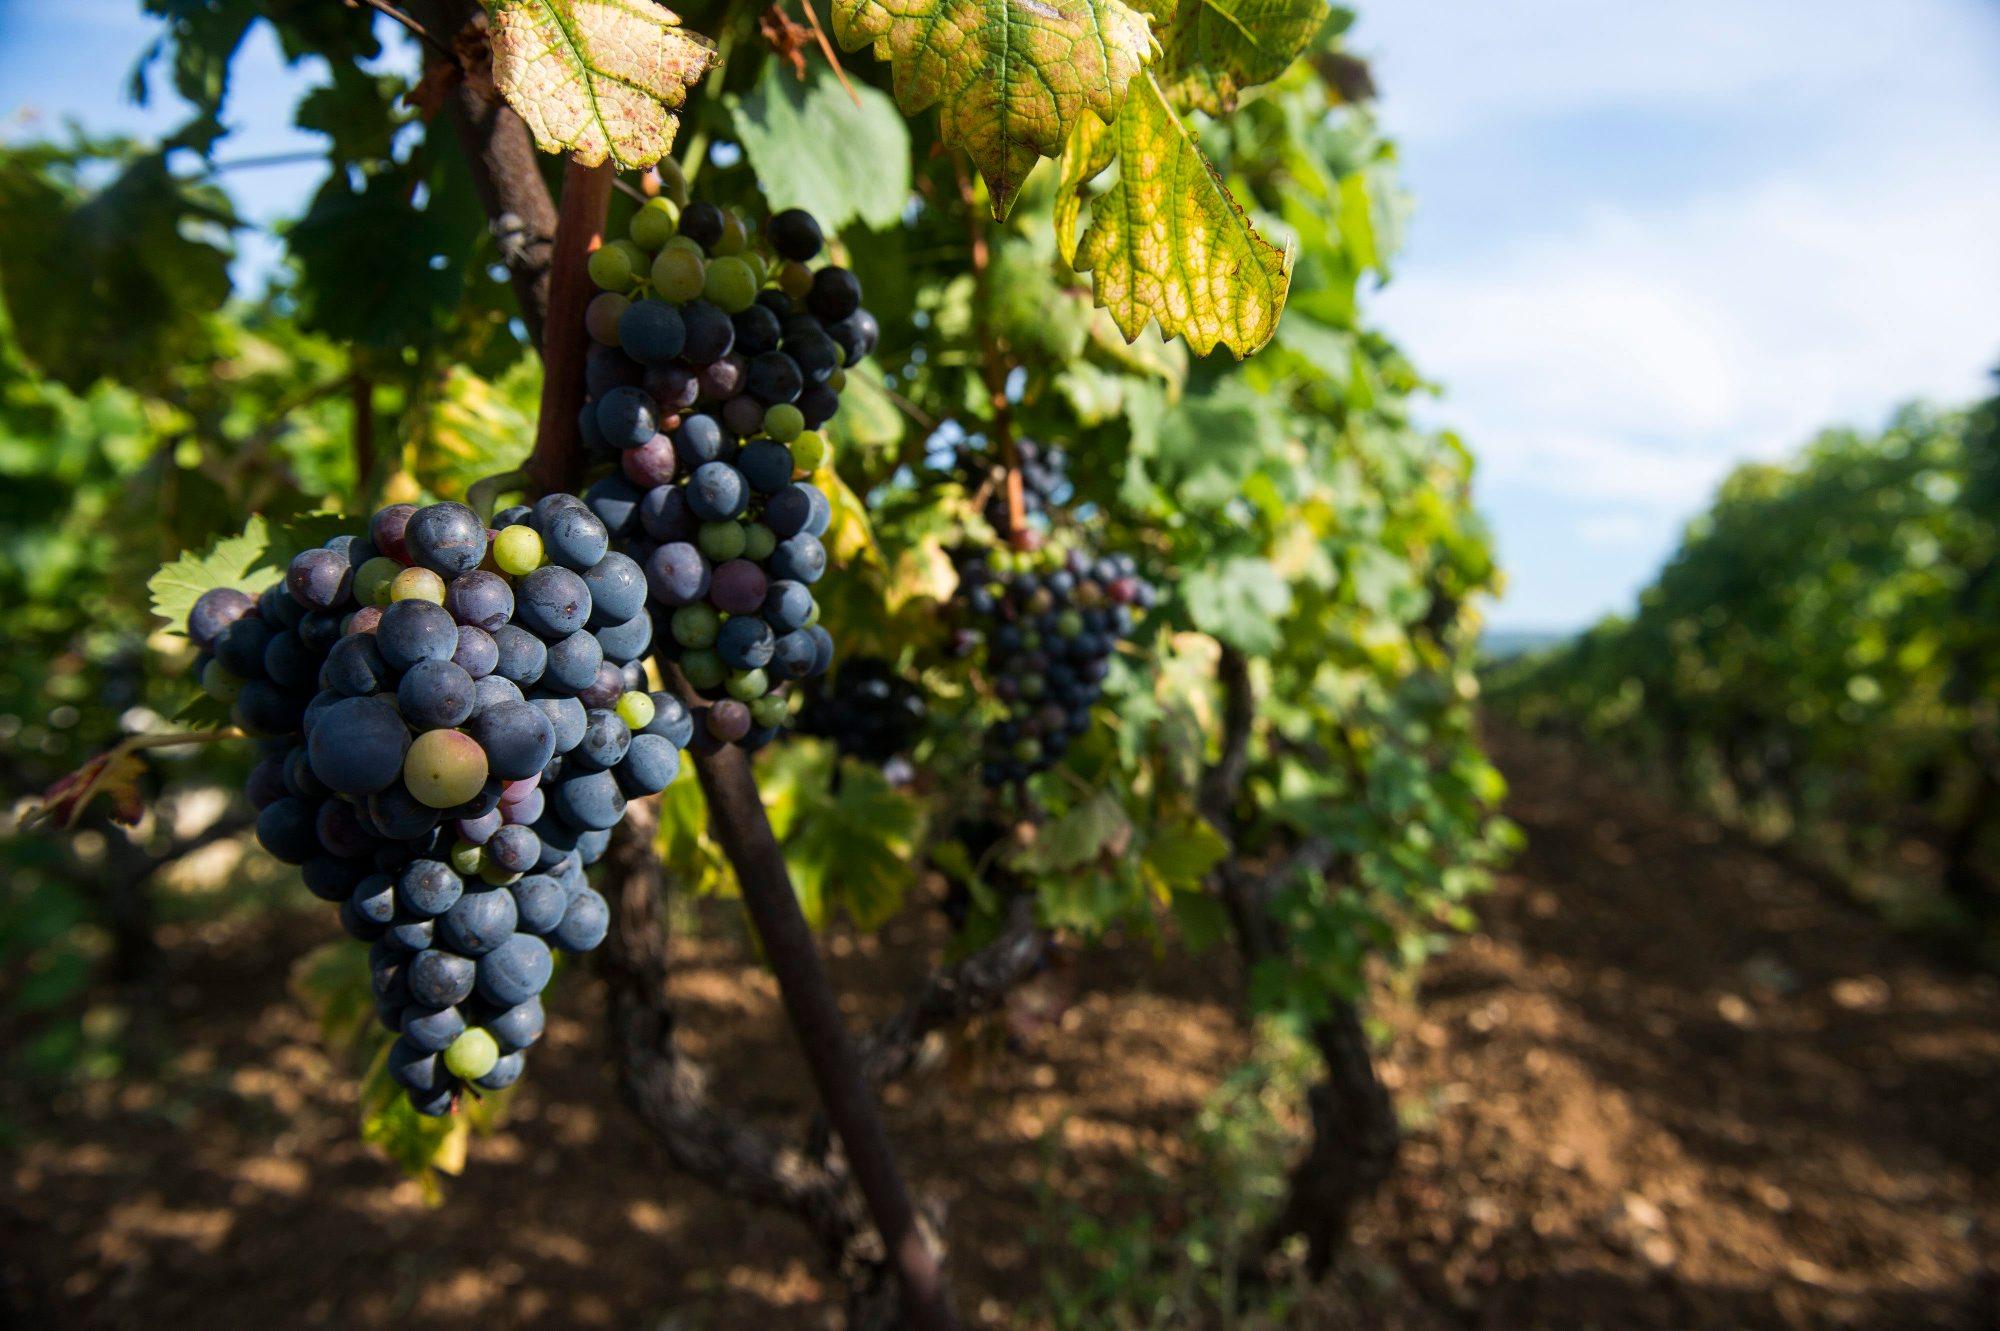 Kastel Stafilic, 120814. Neven Vuina u vinogradu Crljenka u Kastel Stafilicu.  Na fotografiji: vinograd Babice u Kastel Stafilicu. Foto: Tom Dubravec /  CROPIX